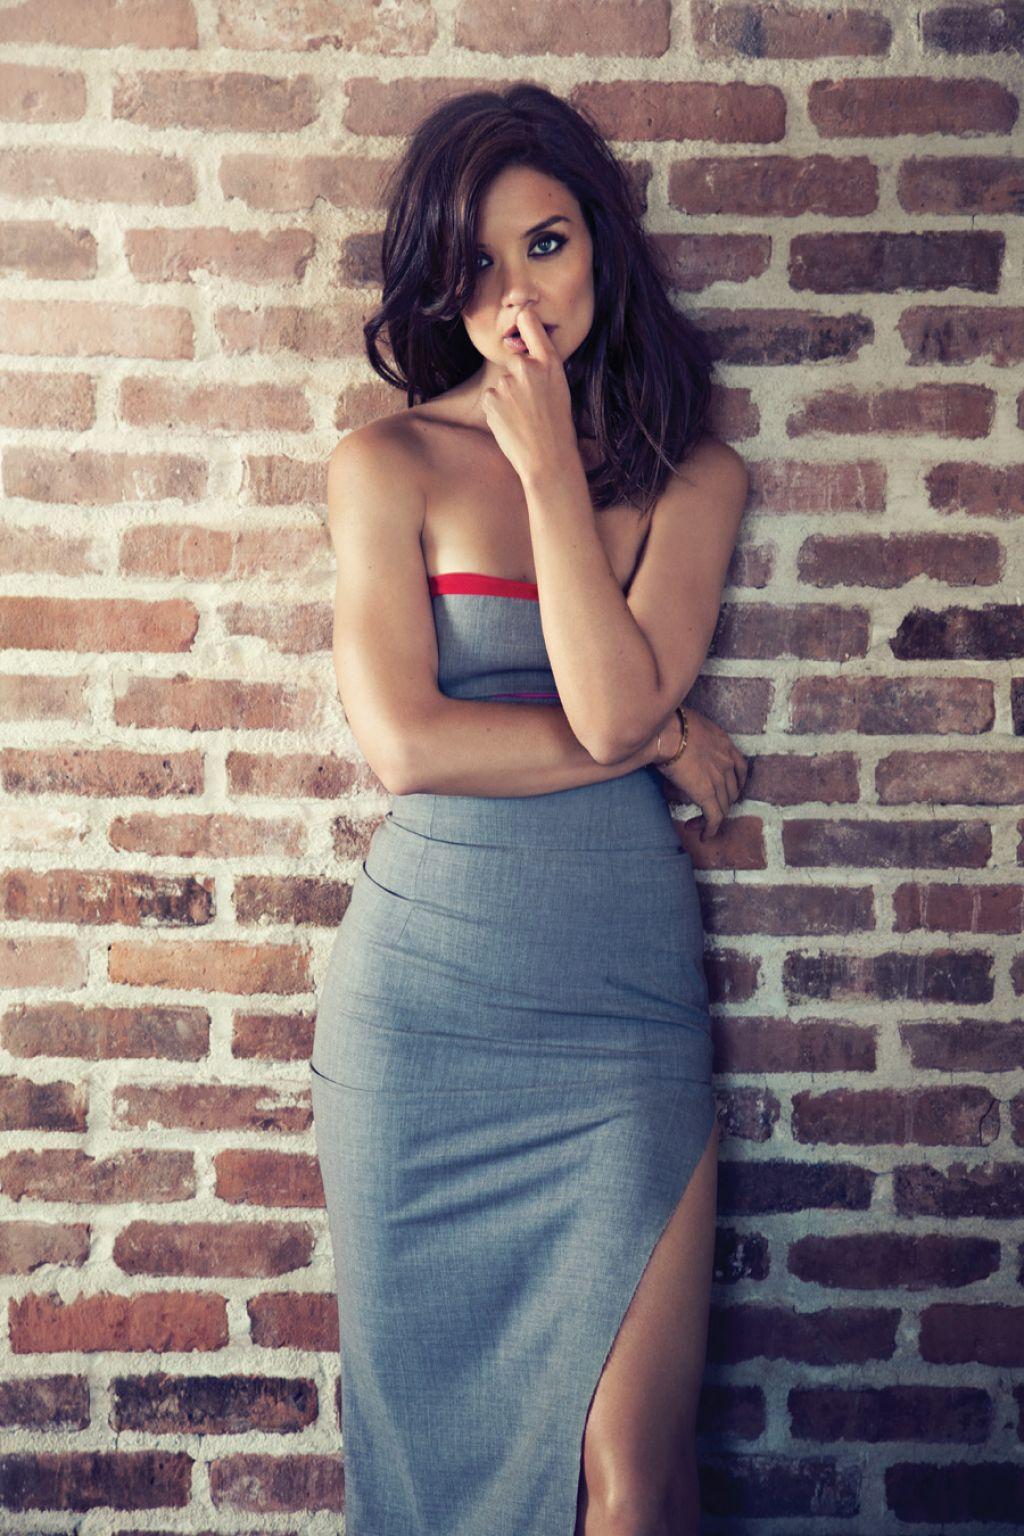 Katie Holmes Photoshoot For New York Moves November 2014